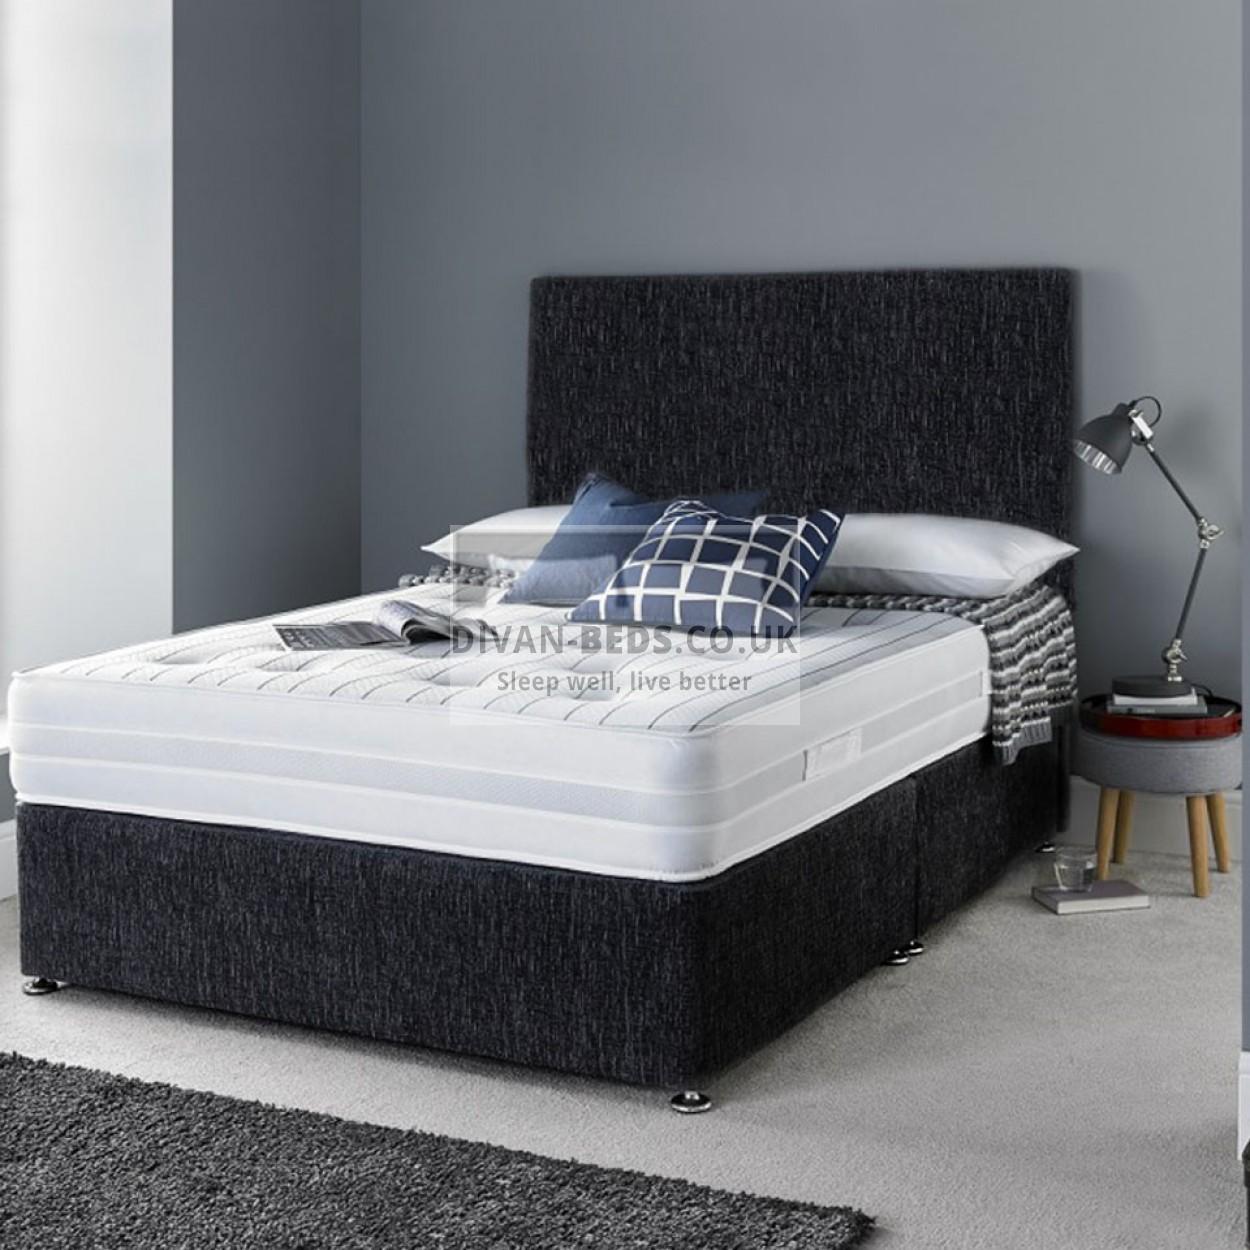 walter divan bed set with 3d airflow spring memory foam. Black Bedroom Furniture Sets. Home Design Ideas